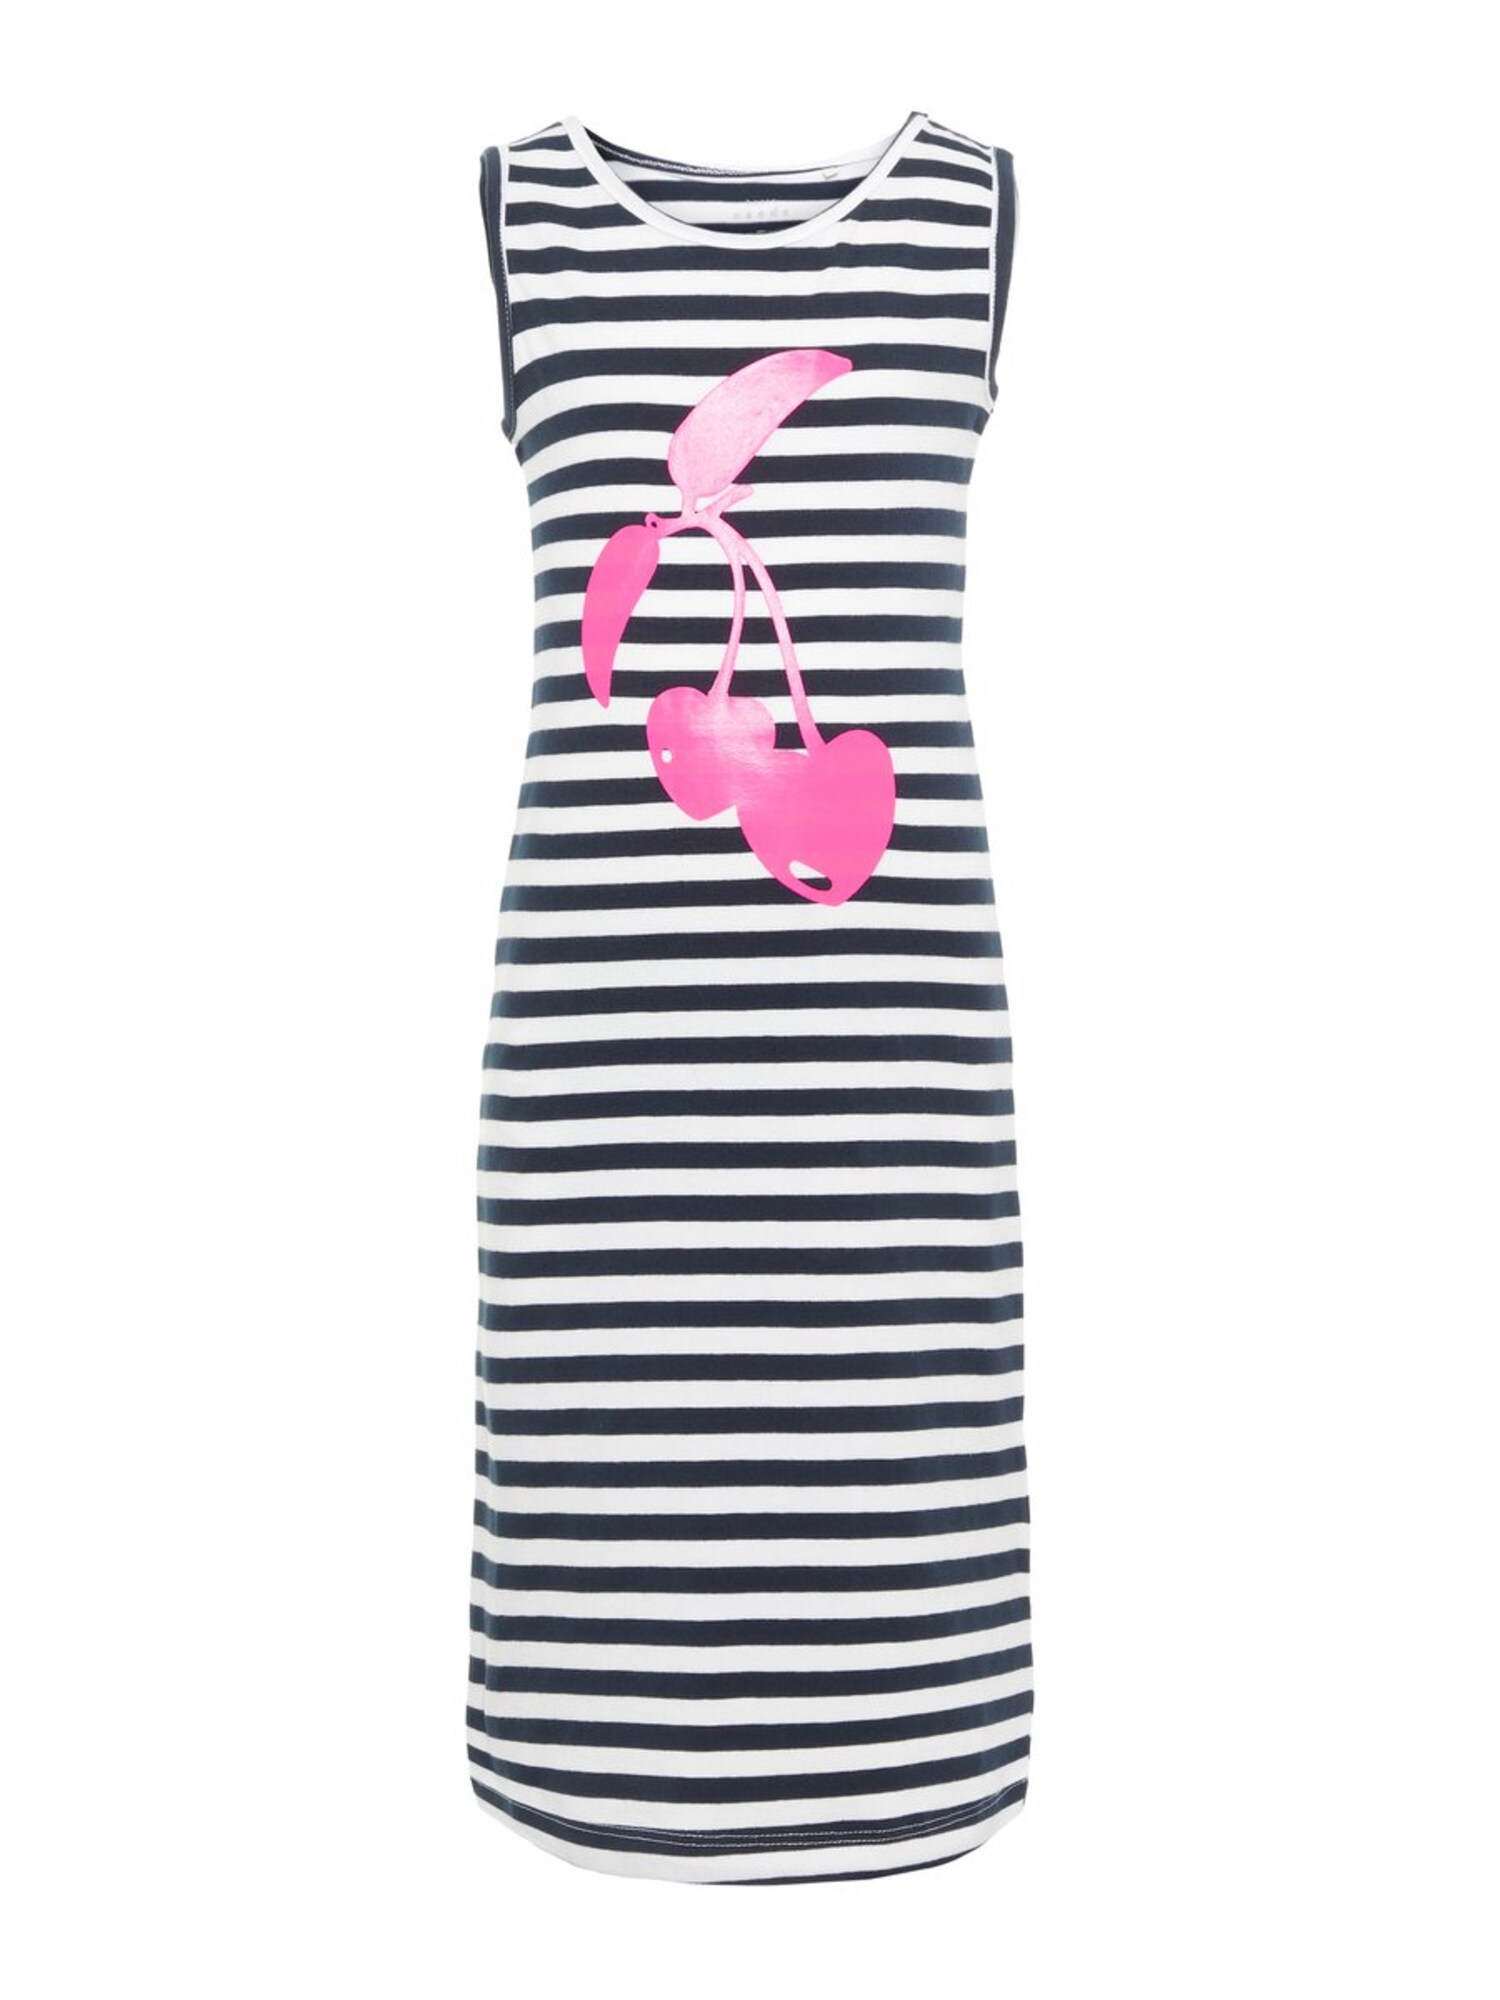 Šaty NKFVIPPA SL MAXI DRESS NOOS kobaltová modř pink bílá NAME IT